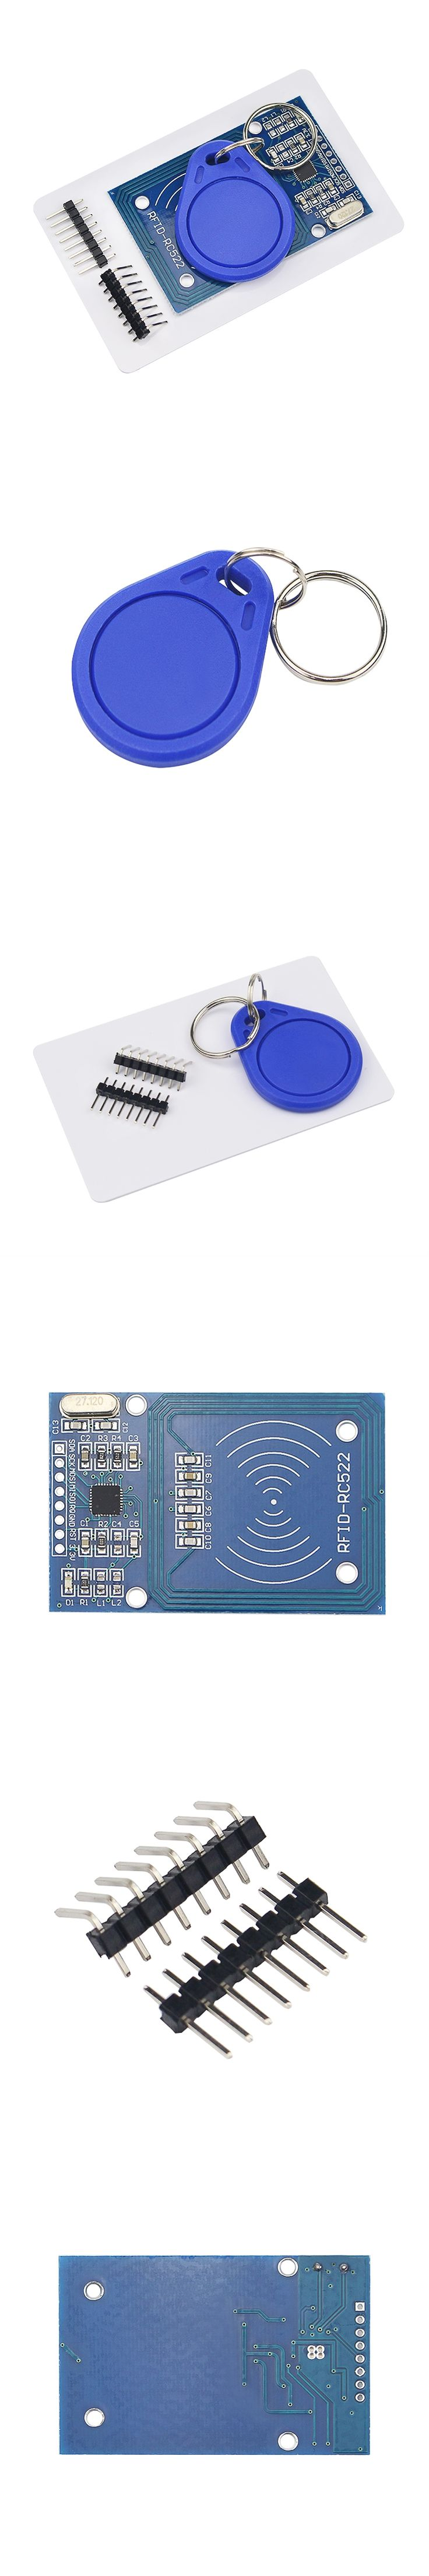 New RC522 MFRC-522 RFID RF IC Card Sensor Module to Send S50 Fudan Card Keychain for Arduino